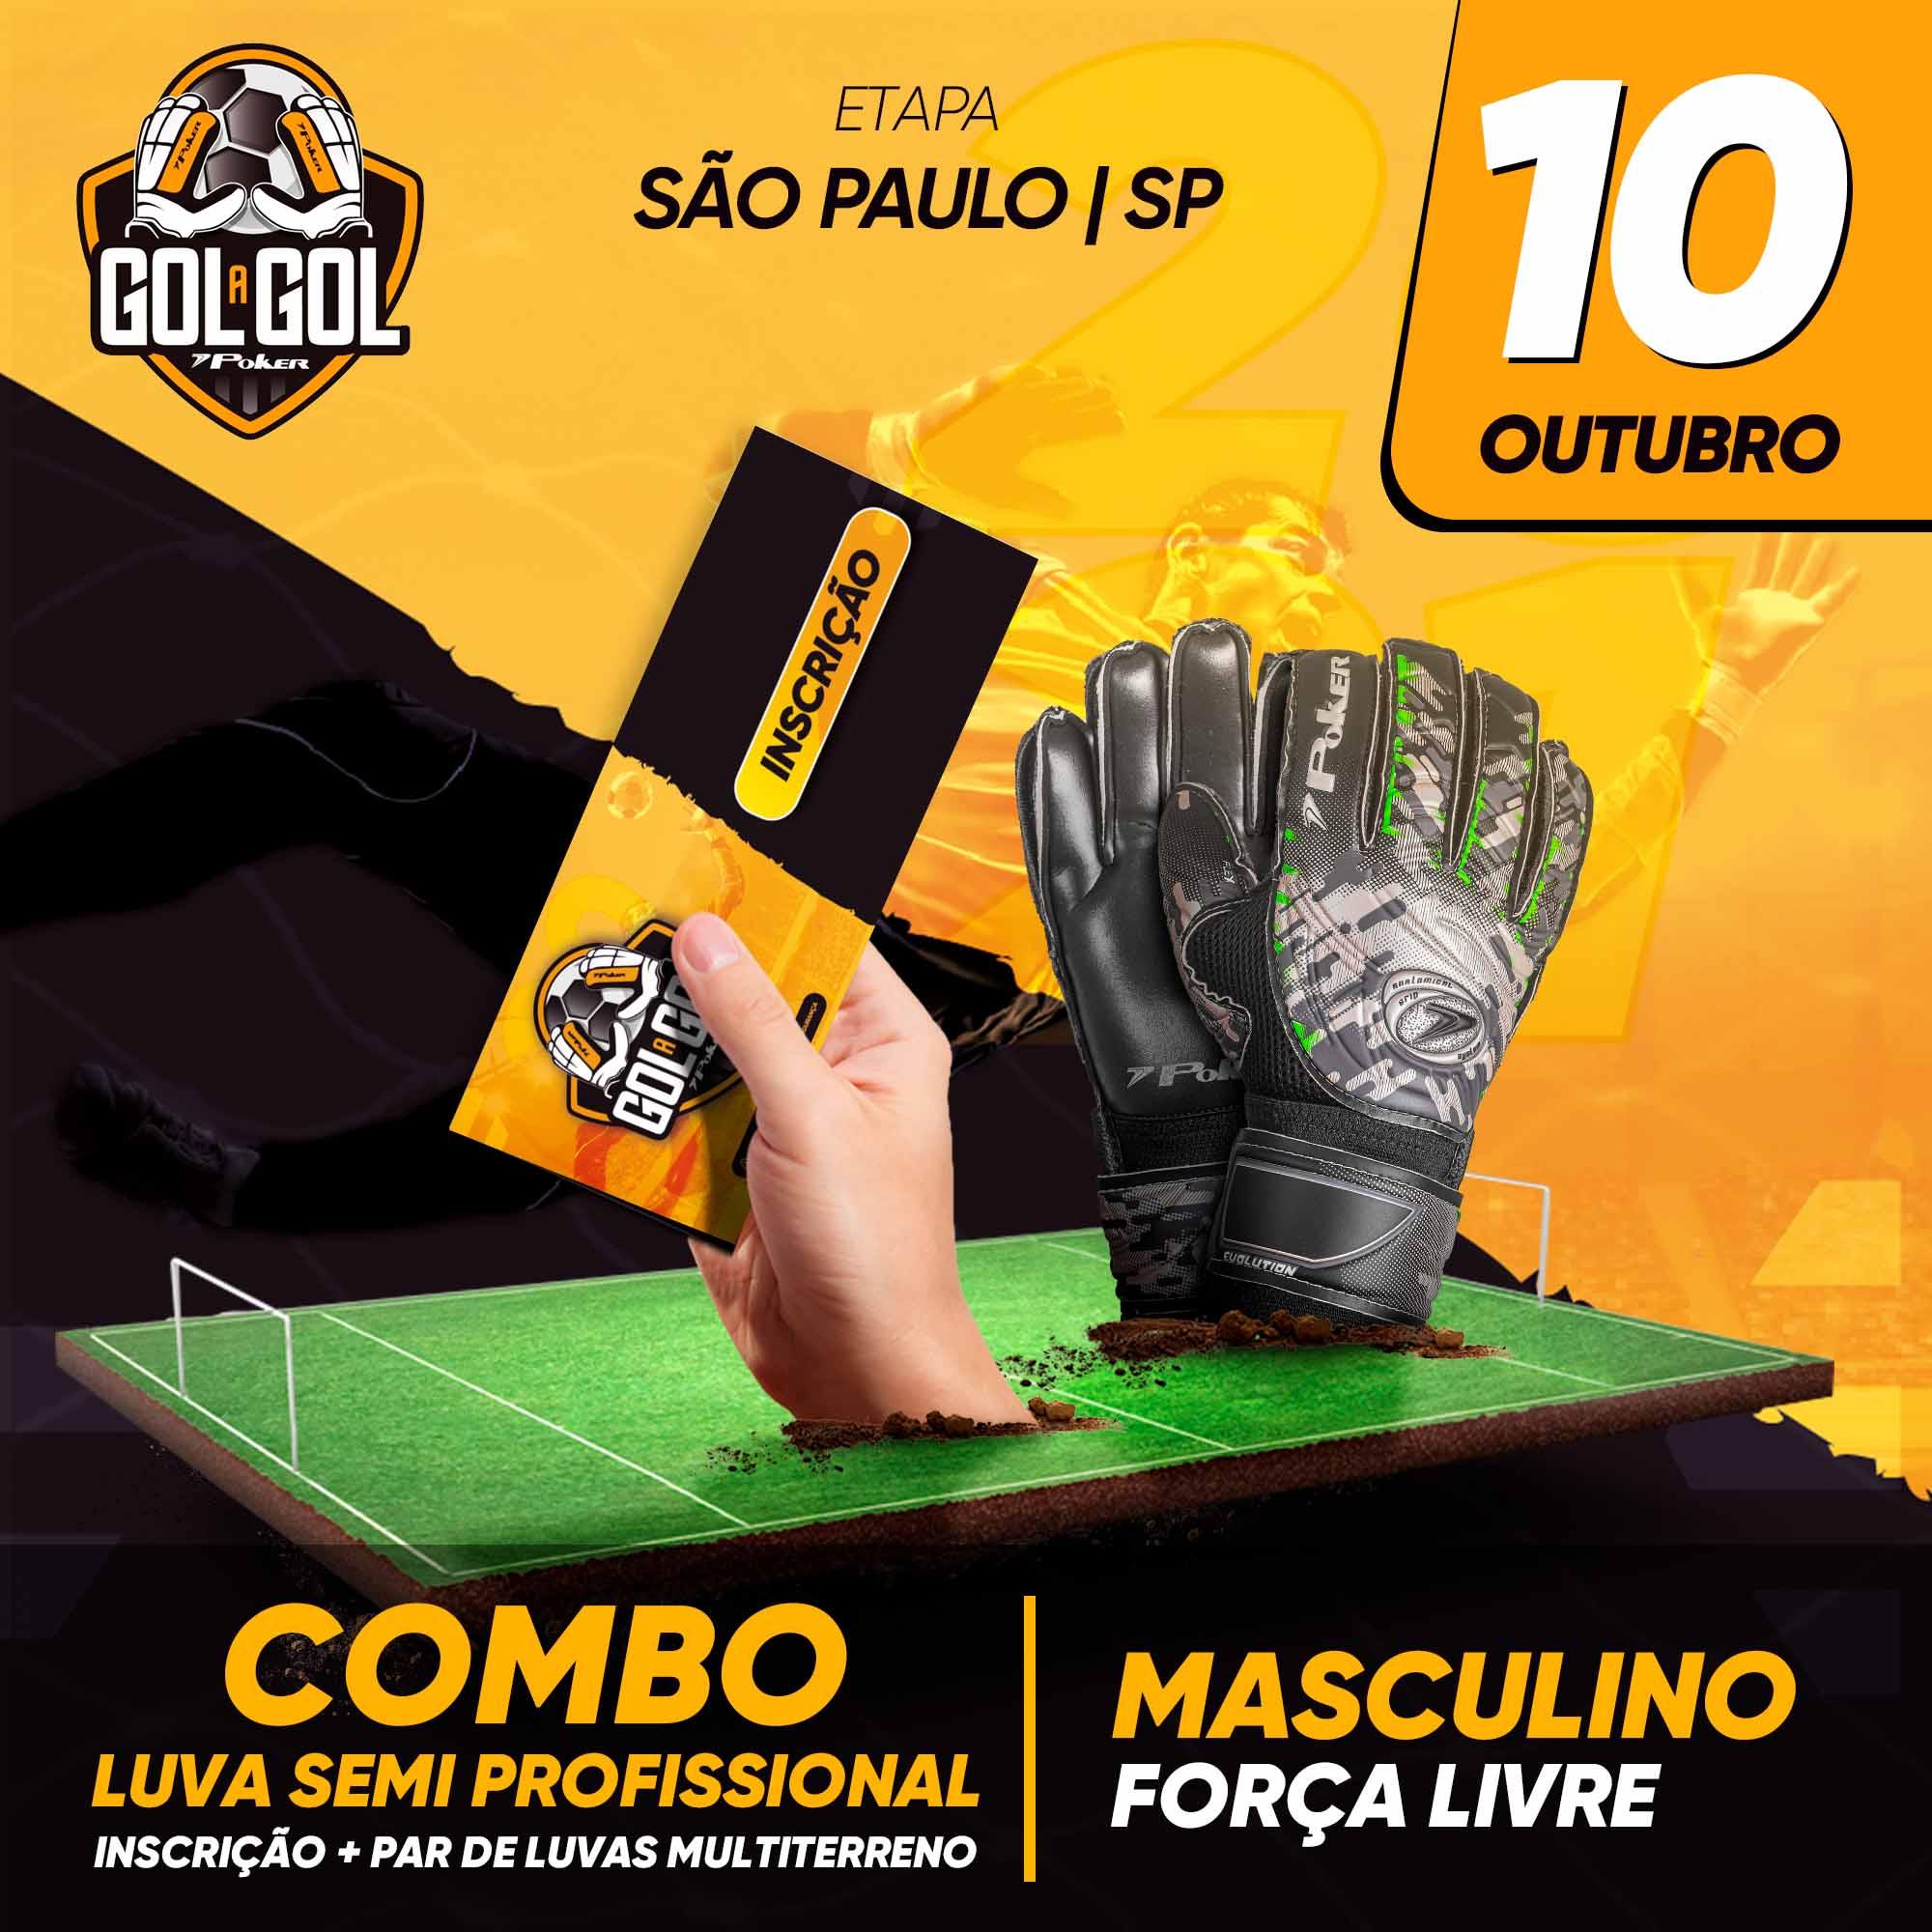 Combo Luva Semi-Profissional   Gol a Gol São Paulo/SP 10/10/2021